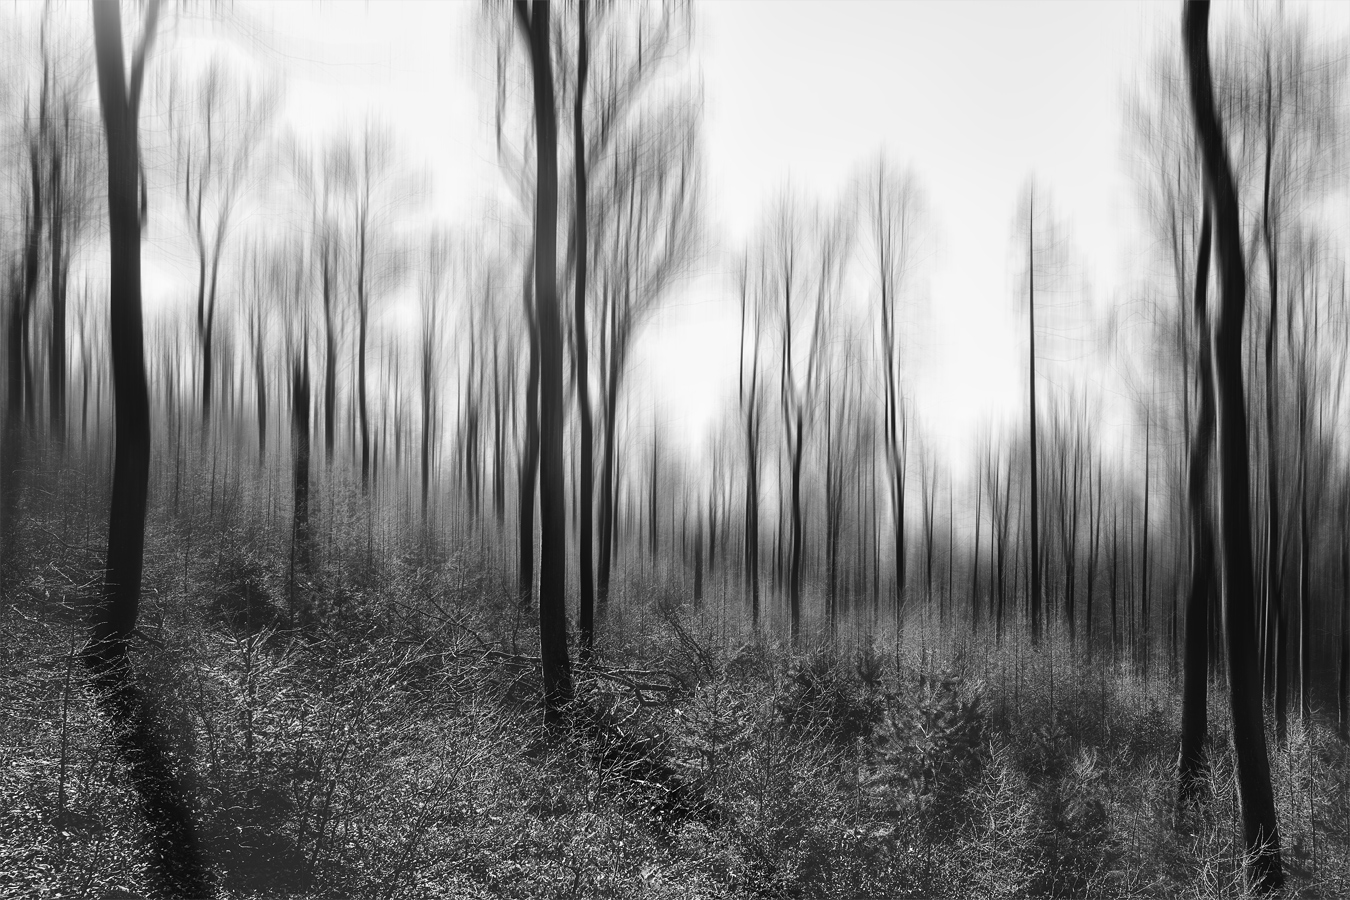 Spessart Forest (2020)